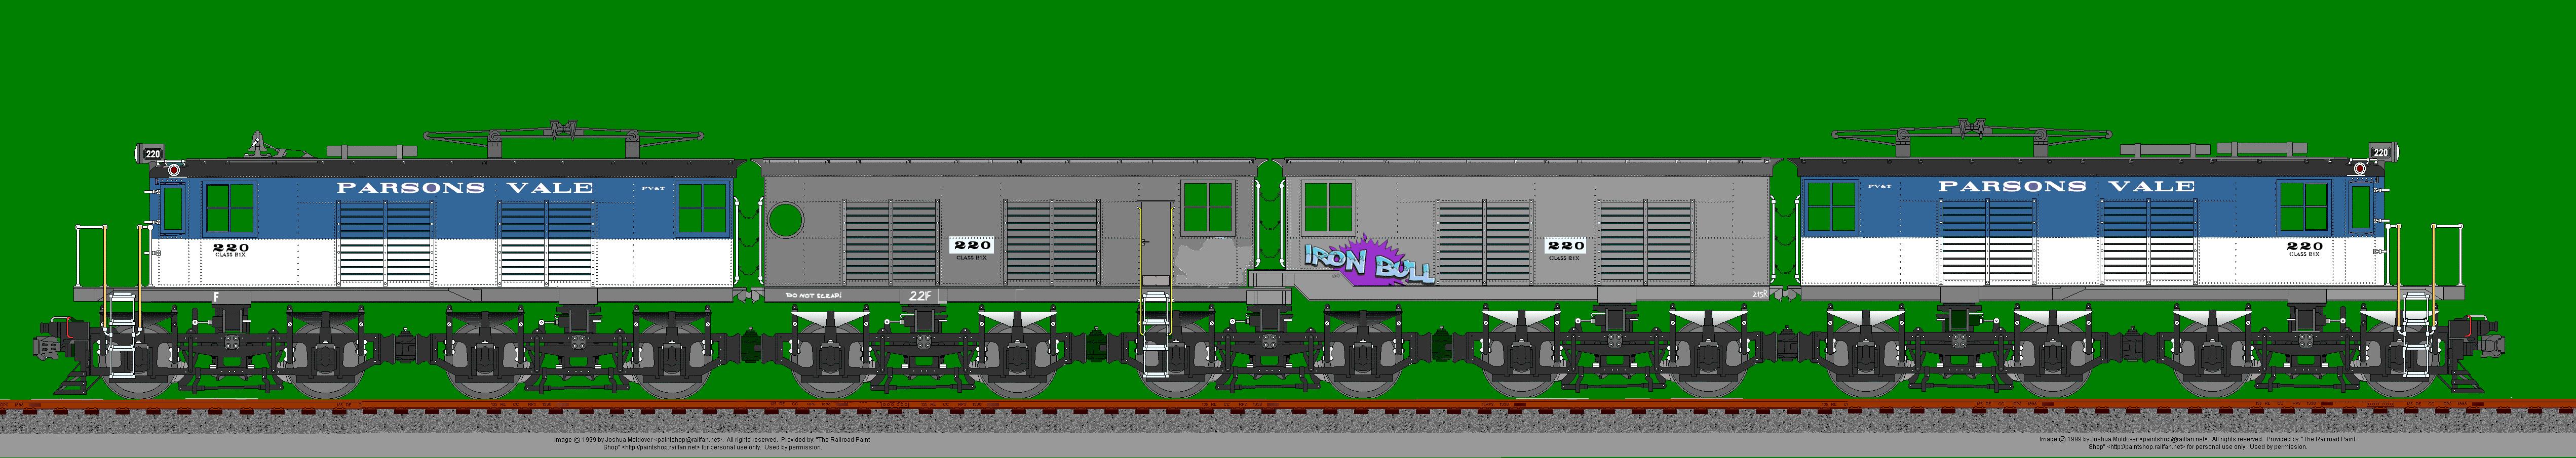 220 -- the class B1x test locomotive